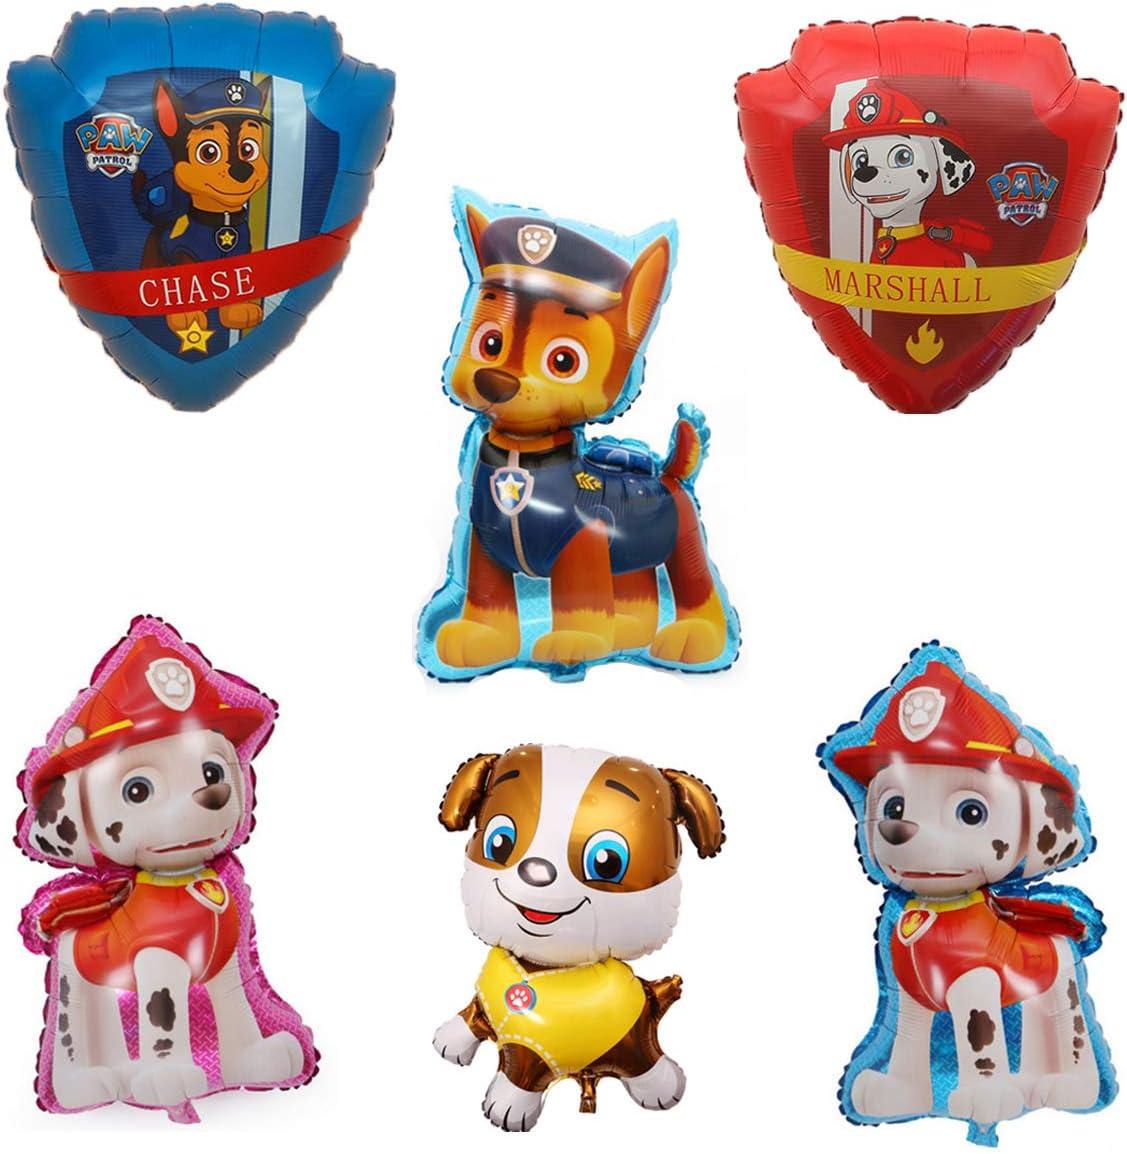 SUNSK Paw Dog Patrol Globos Foil Cumplea/ño Balloons Decorar Fiestas Suministros Party Decoraci/ón Ni/ños Regalo 6 Piezas